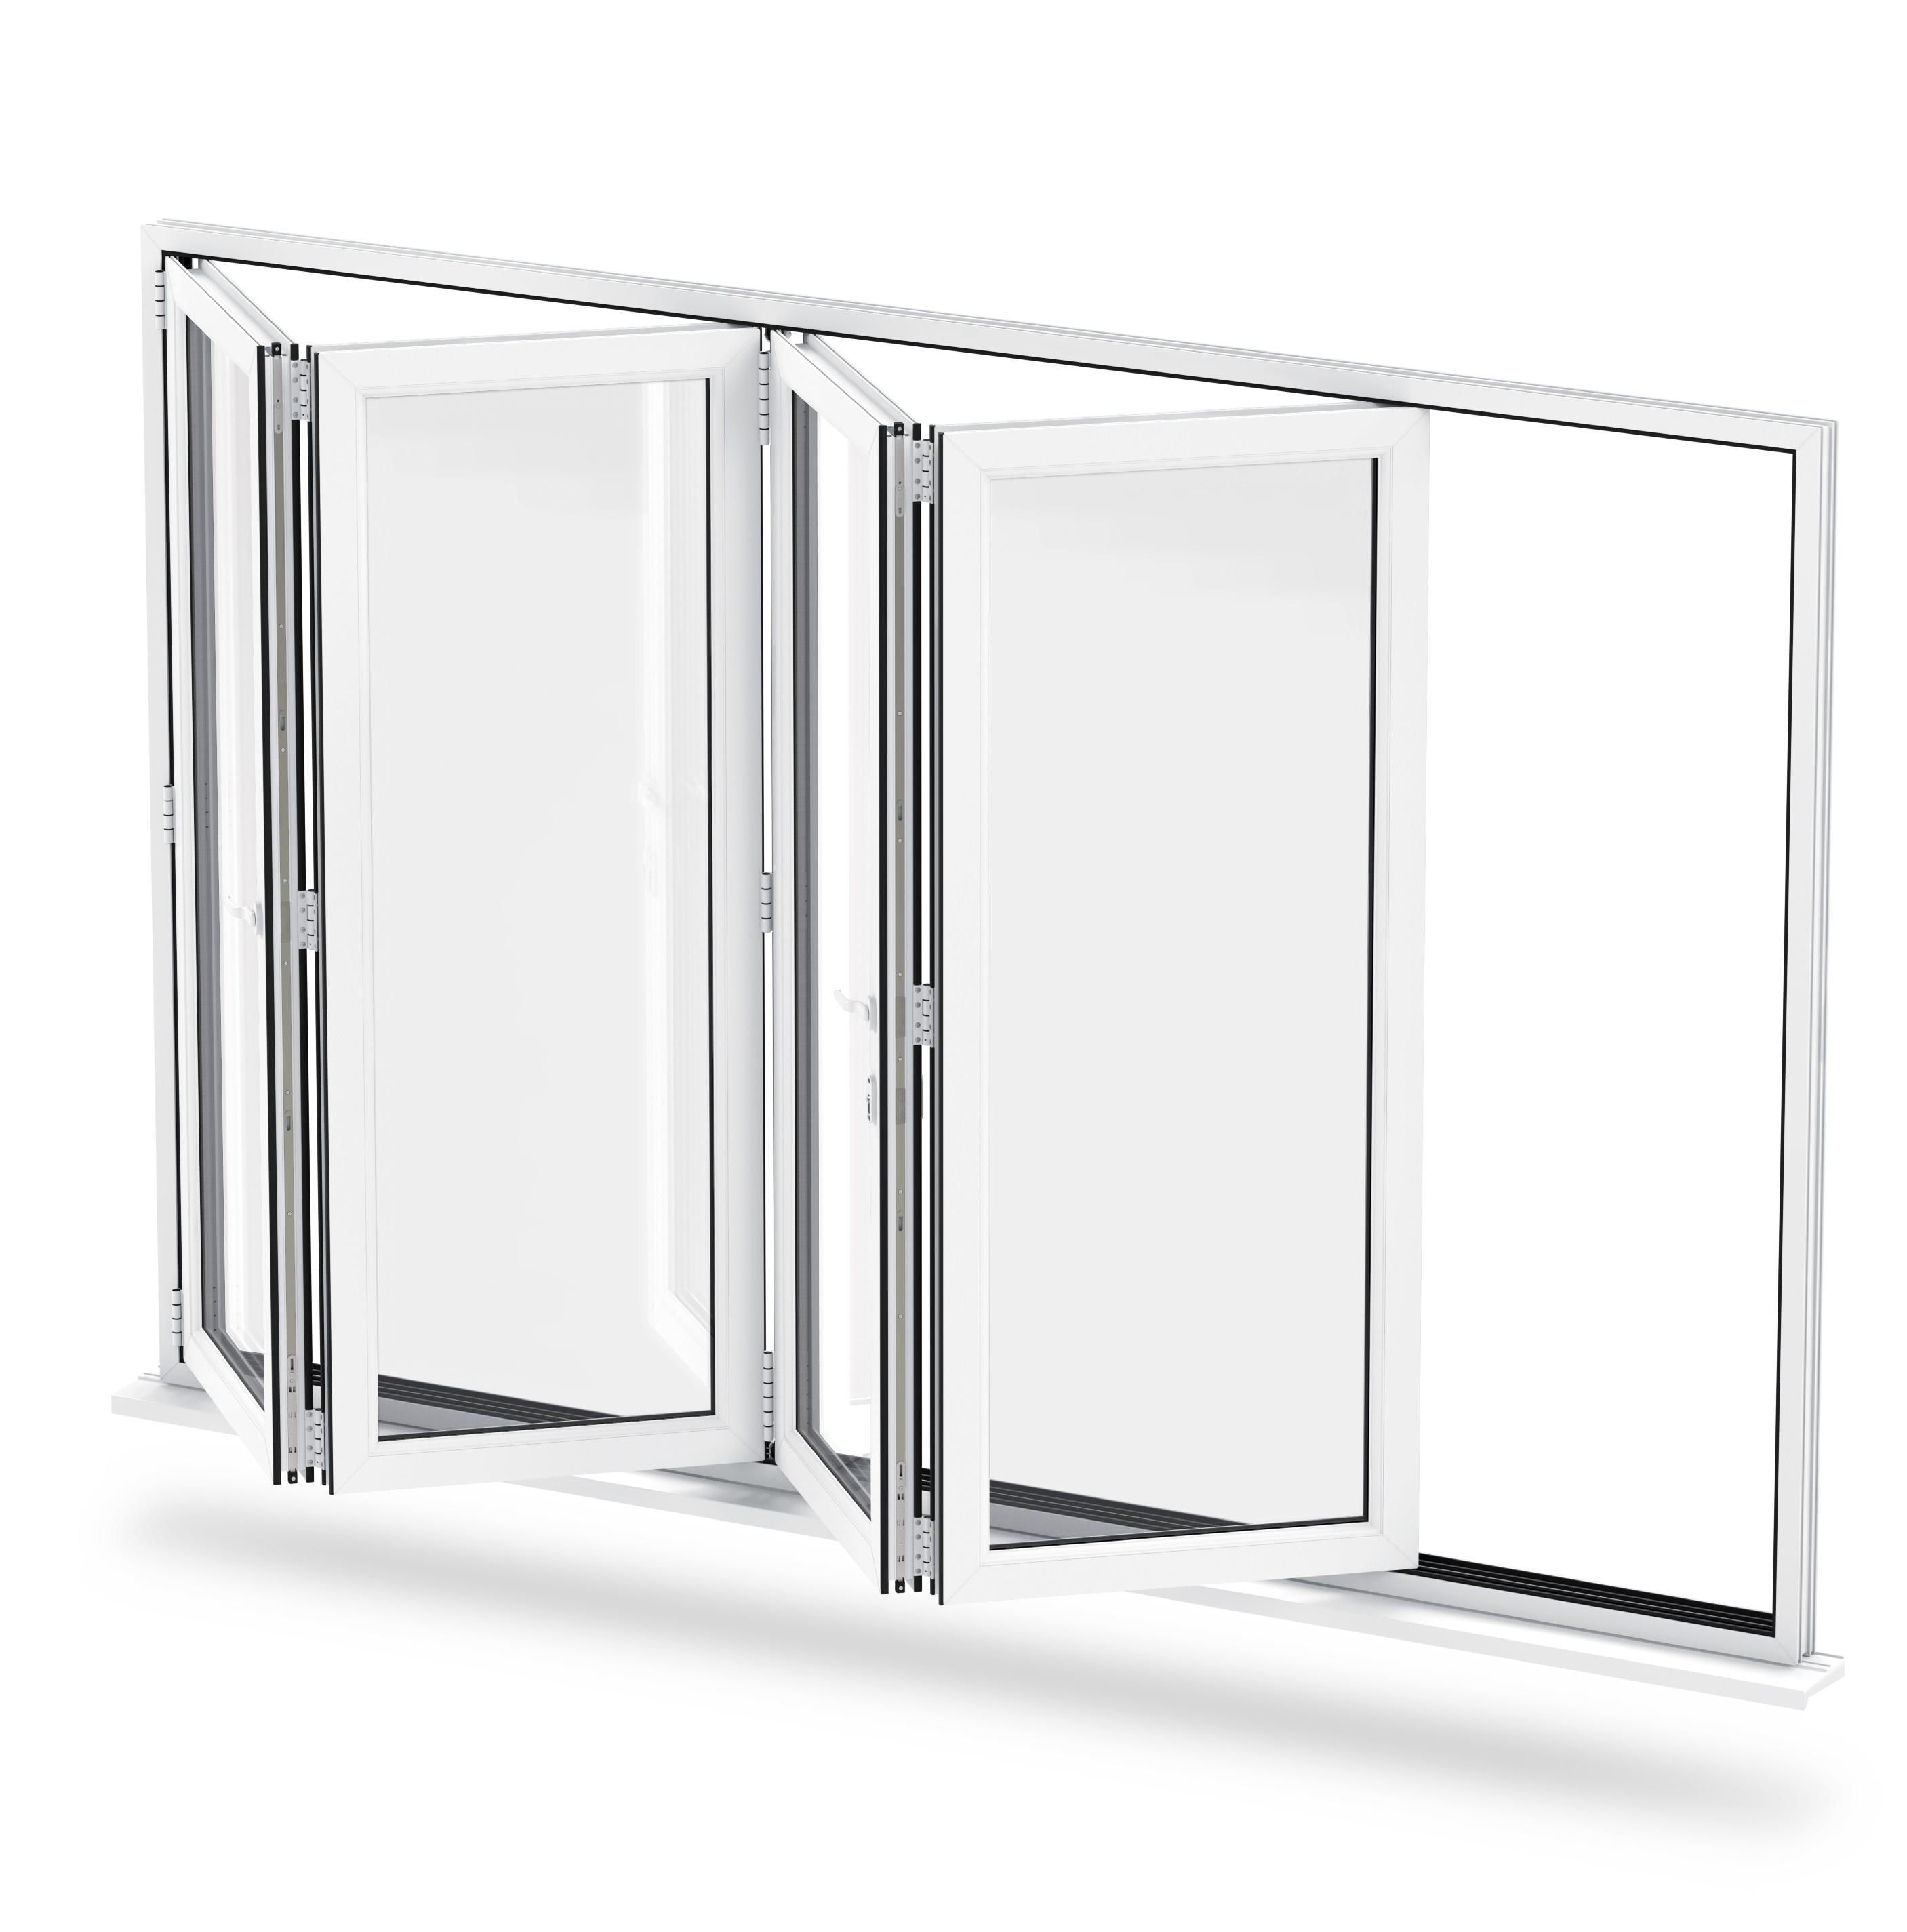 secure bi-folding door